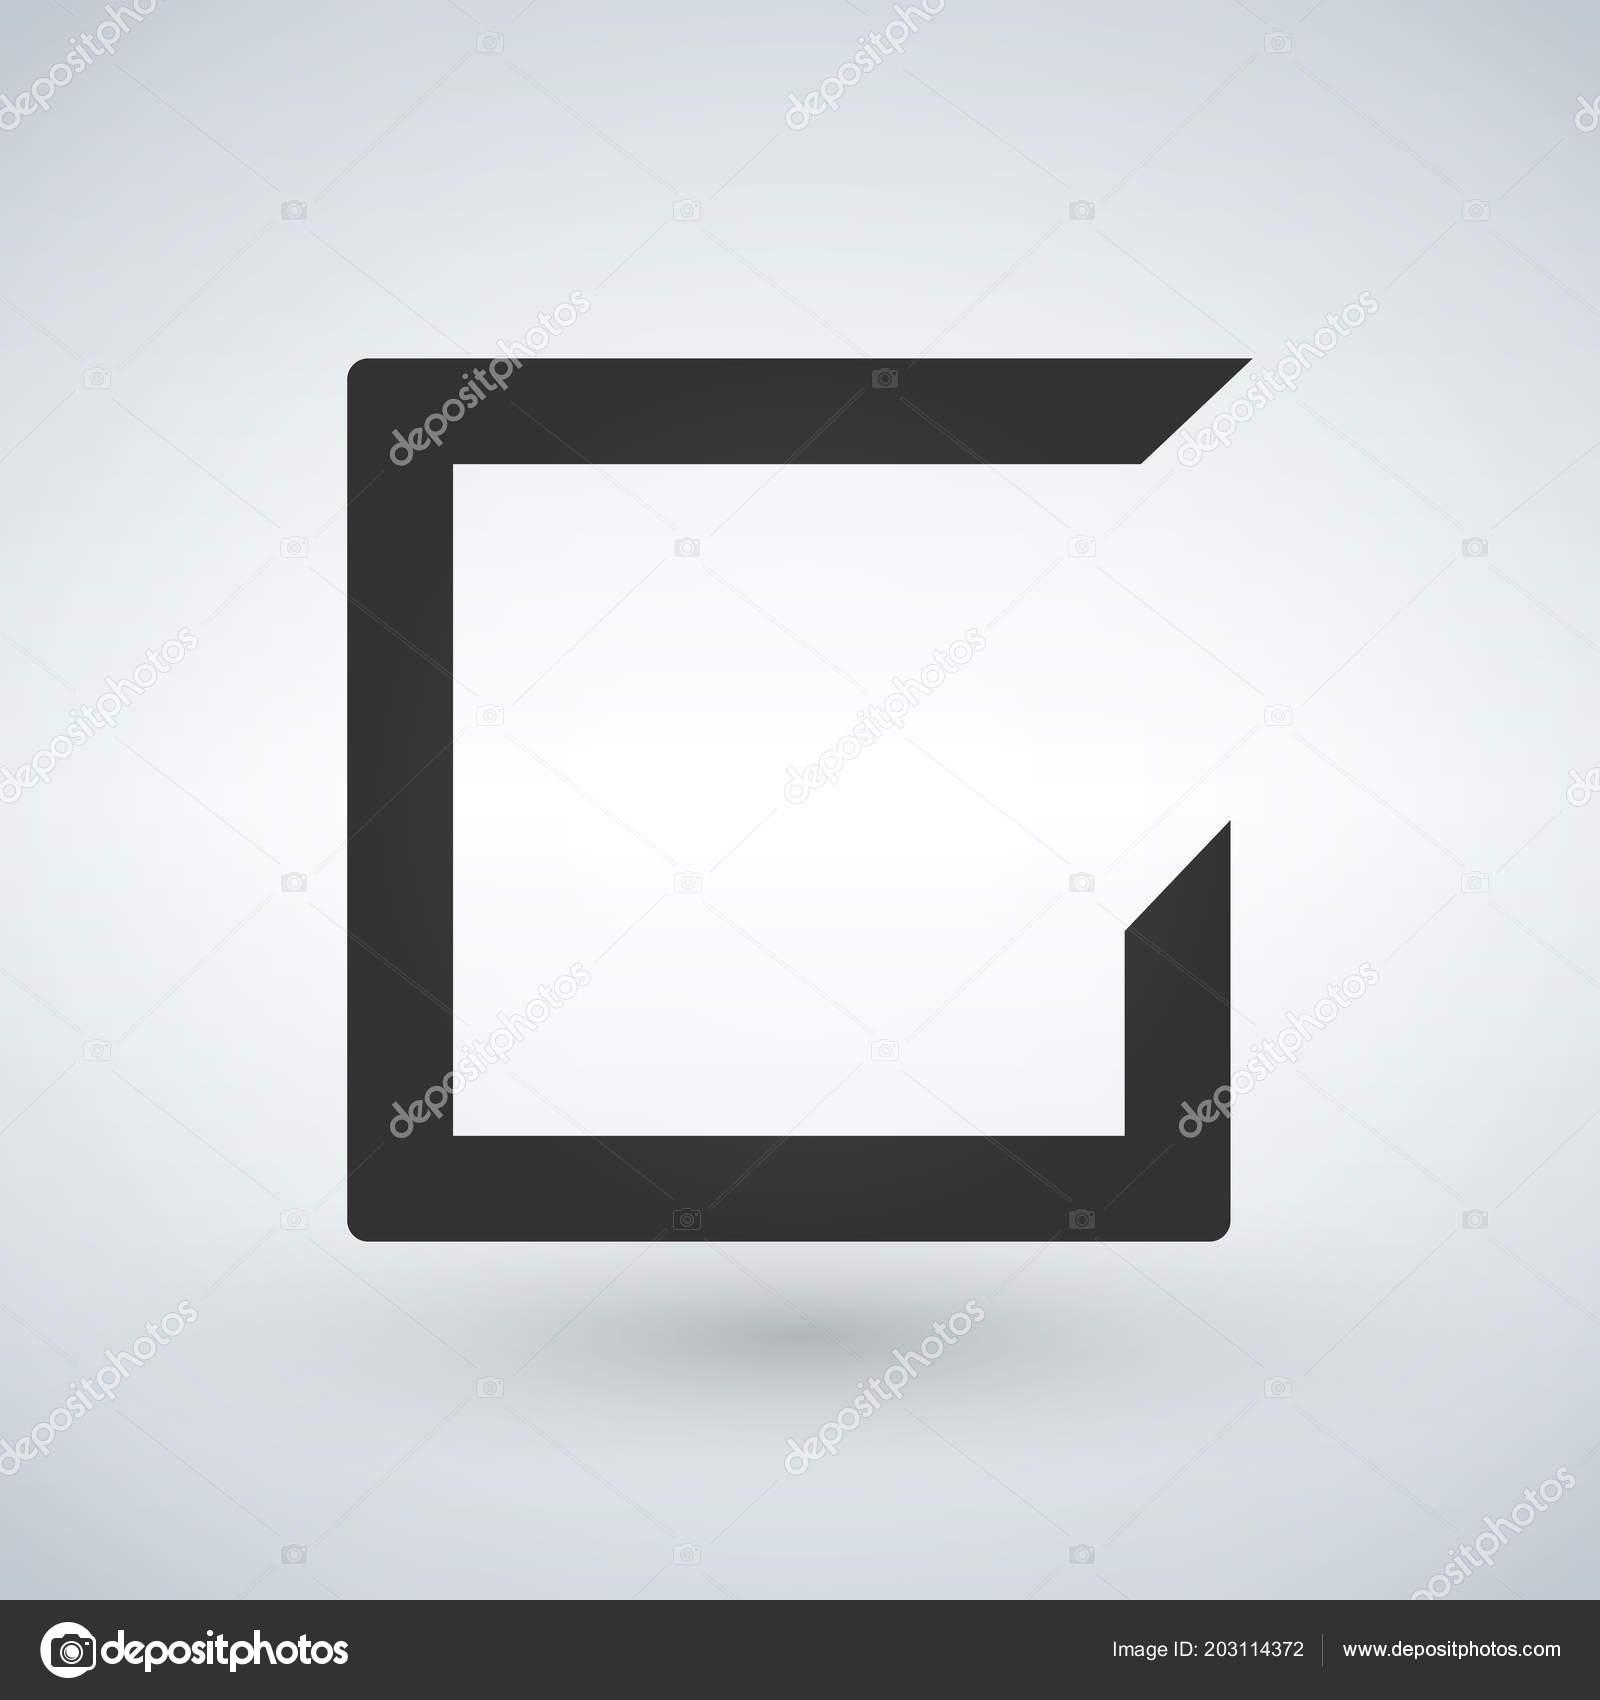 Vector Blank Box Or Frame Template Illustration Isolated On White Background Stockvektor